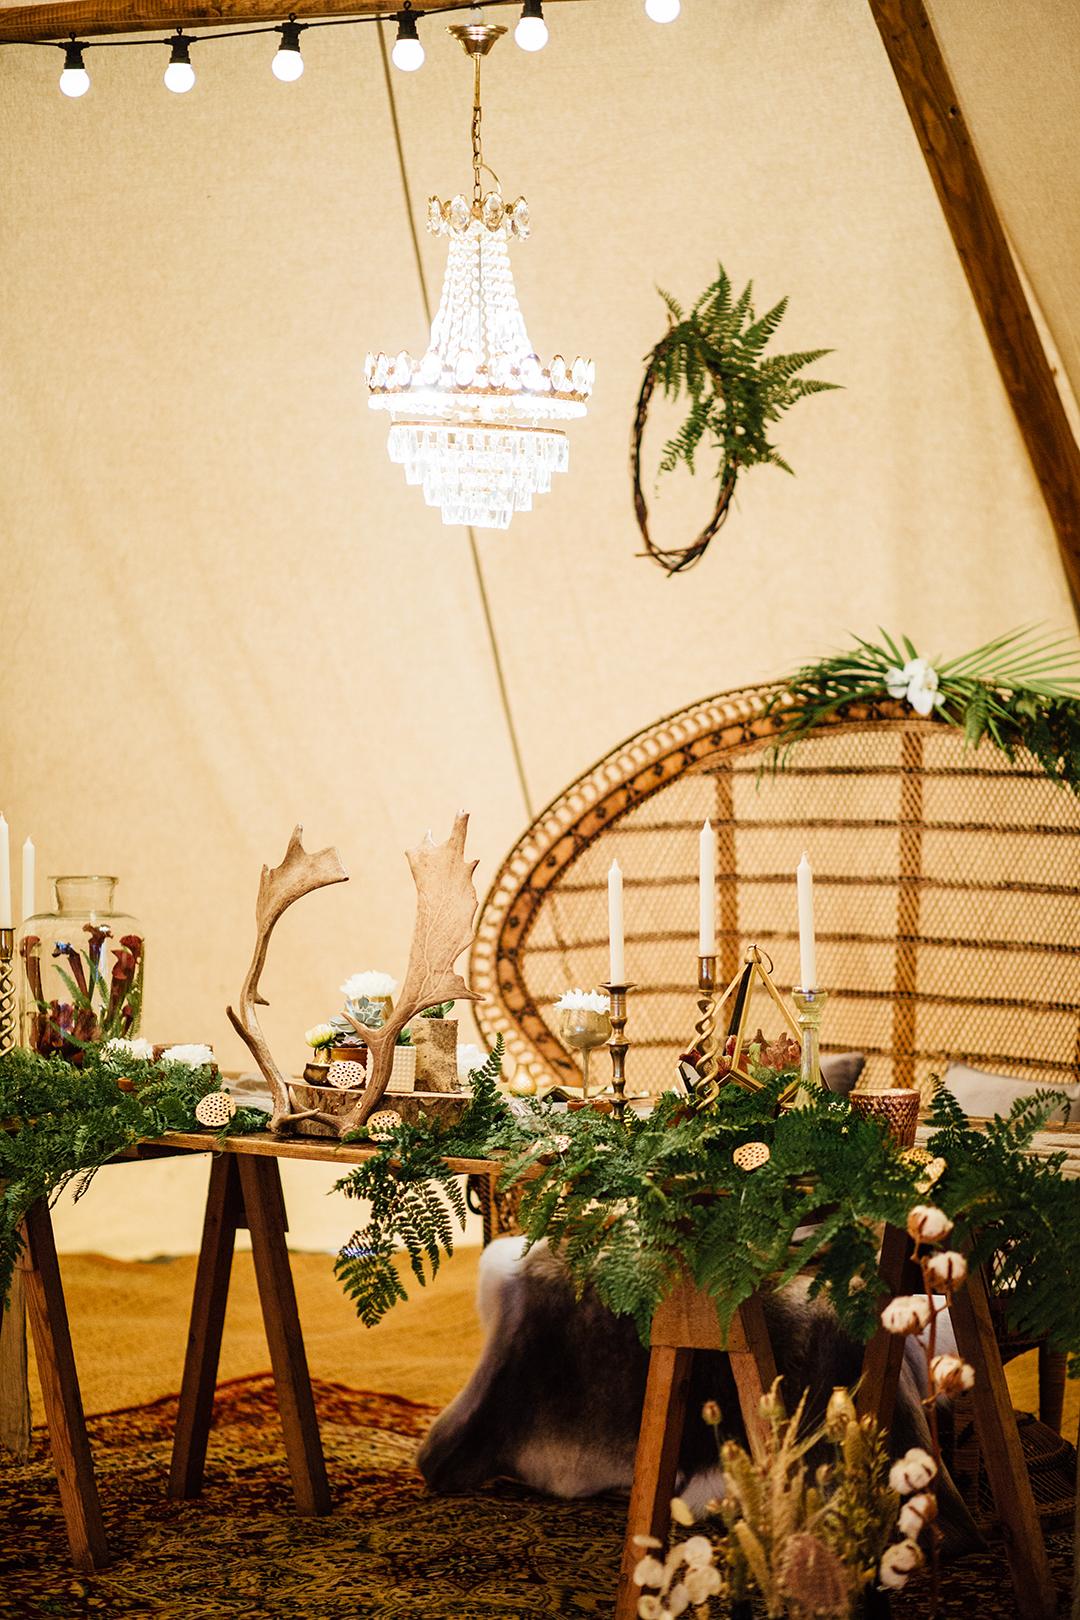 Kkent-outdoor-festival-wedding-venue-wilderness-weddings